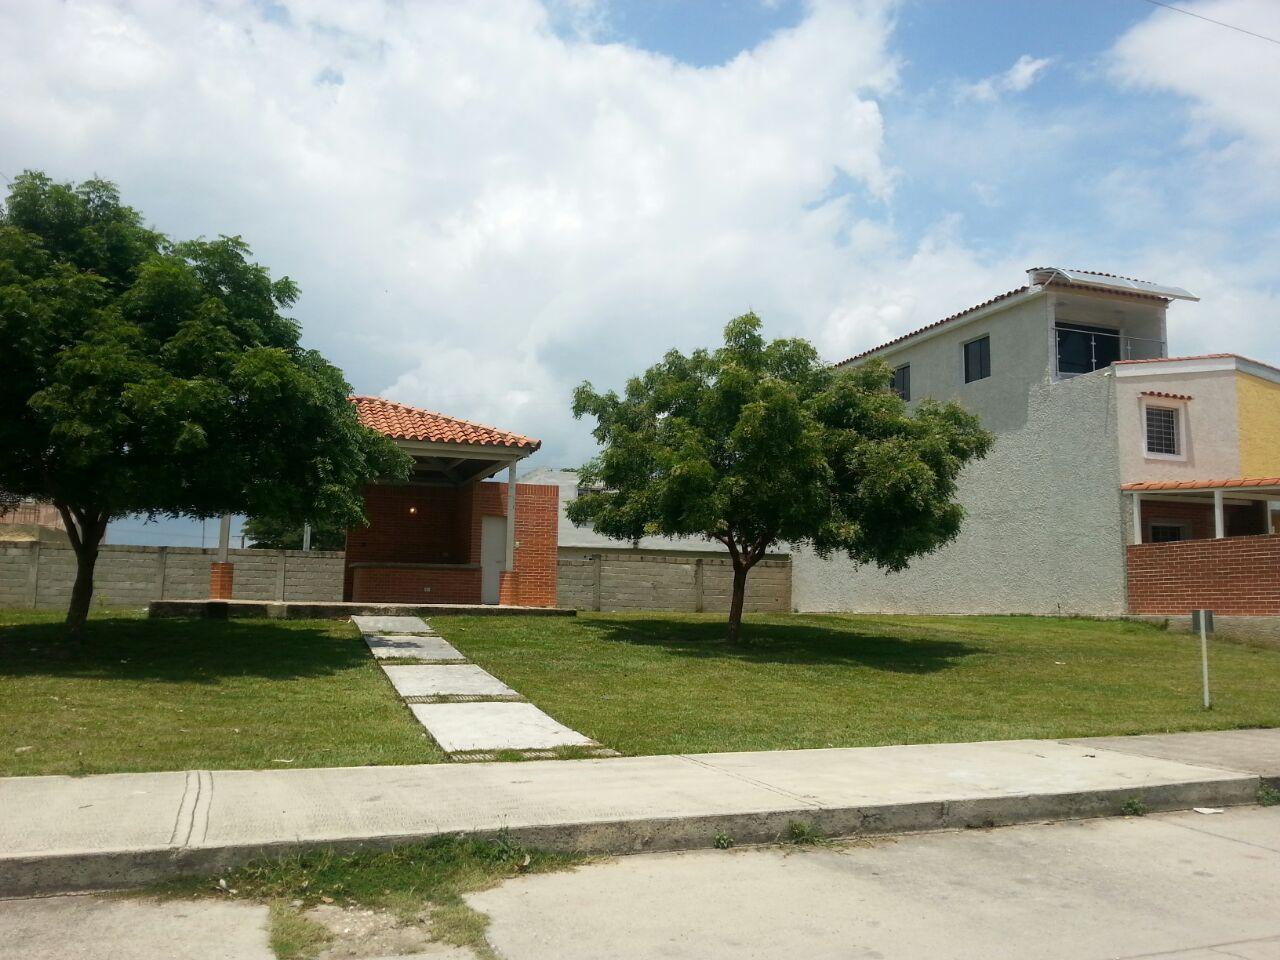 Residencias Tierranueva Urbanización Calicanto Valencia